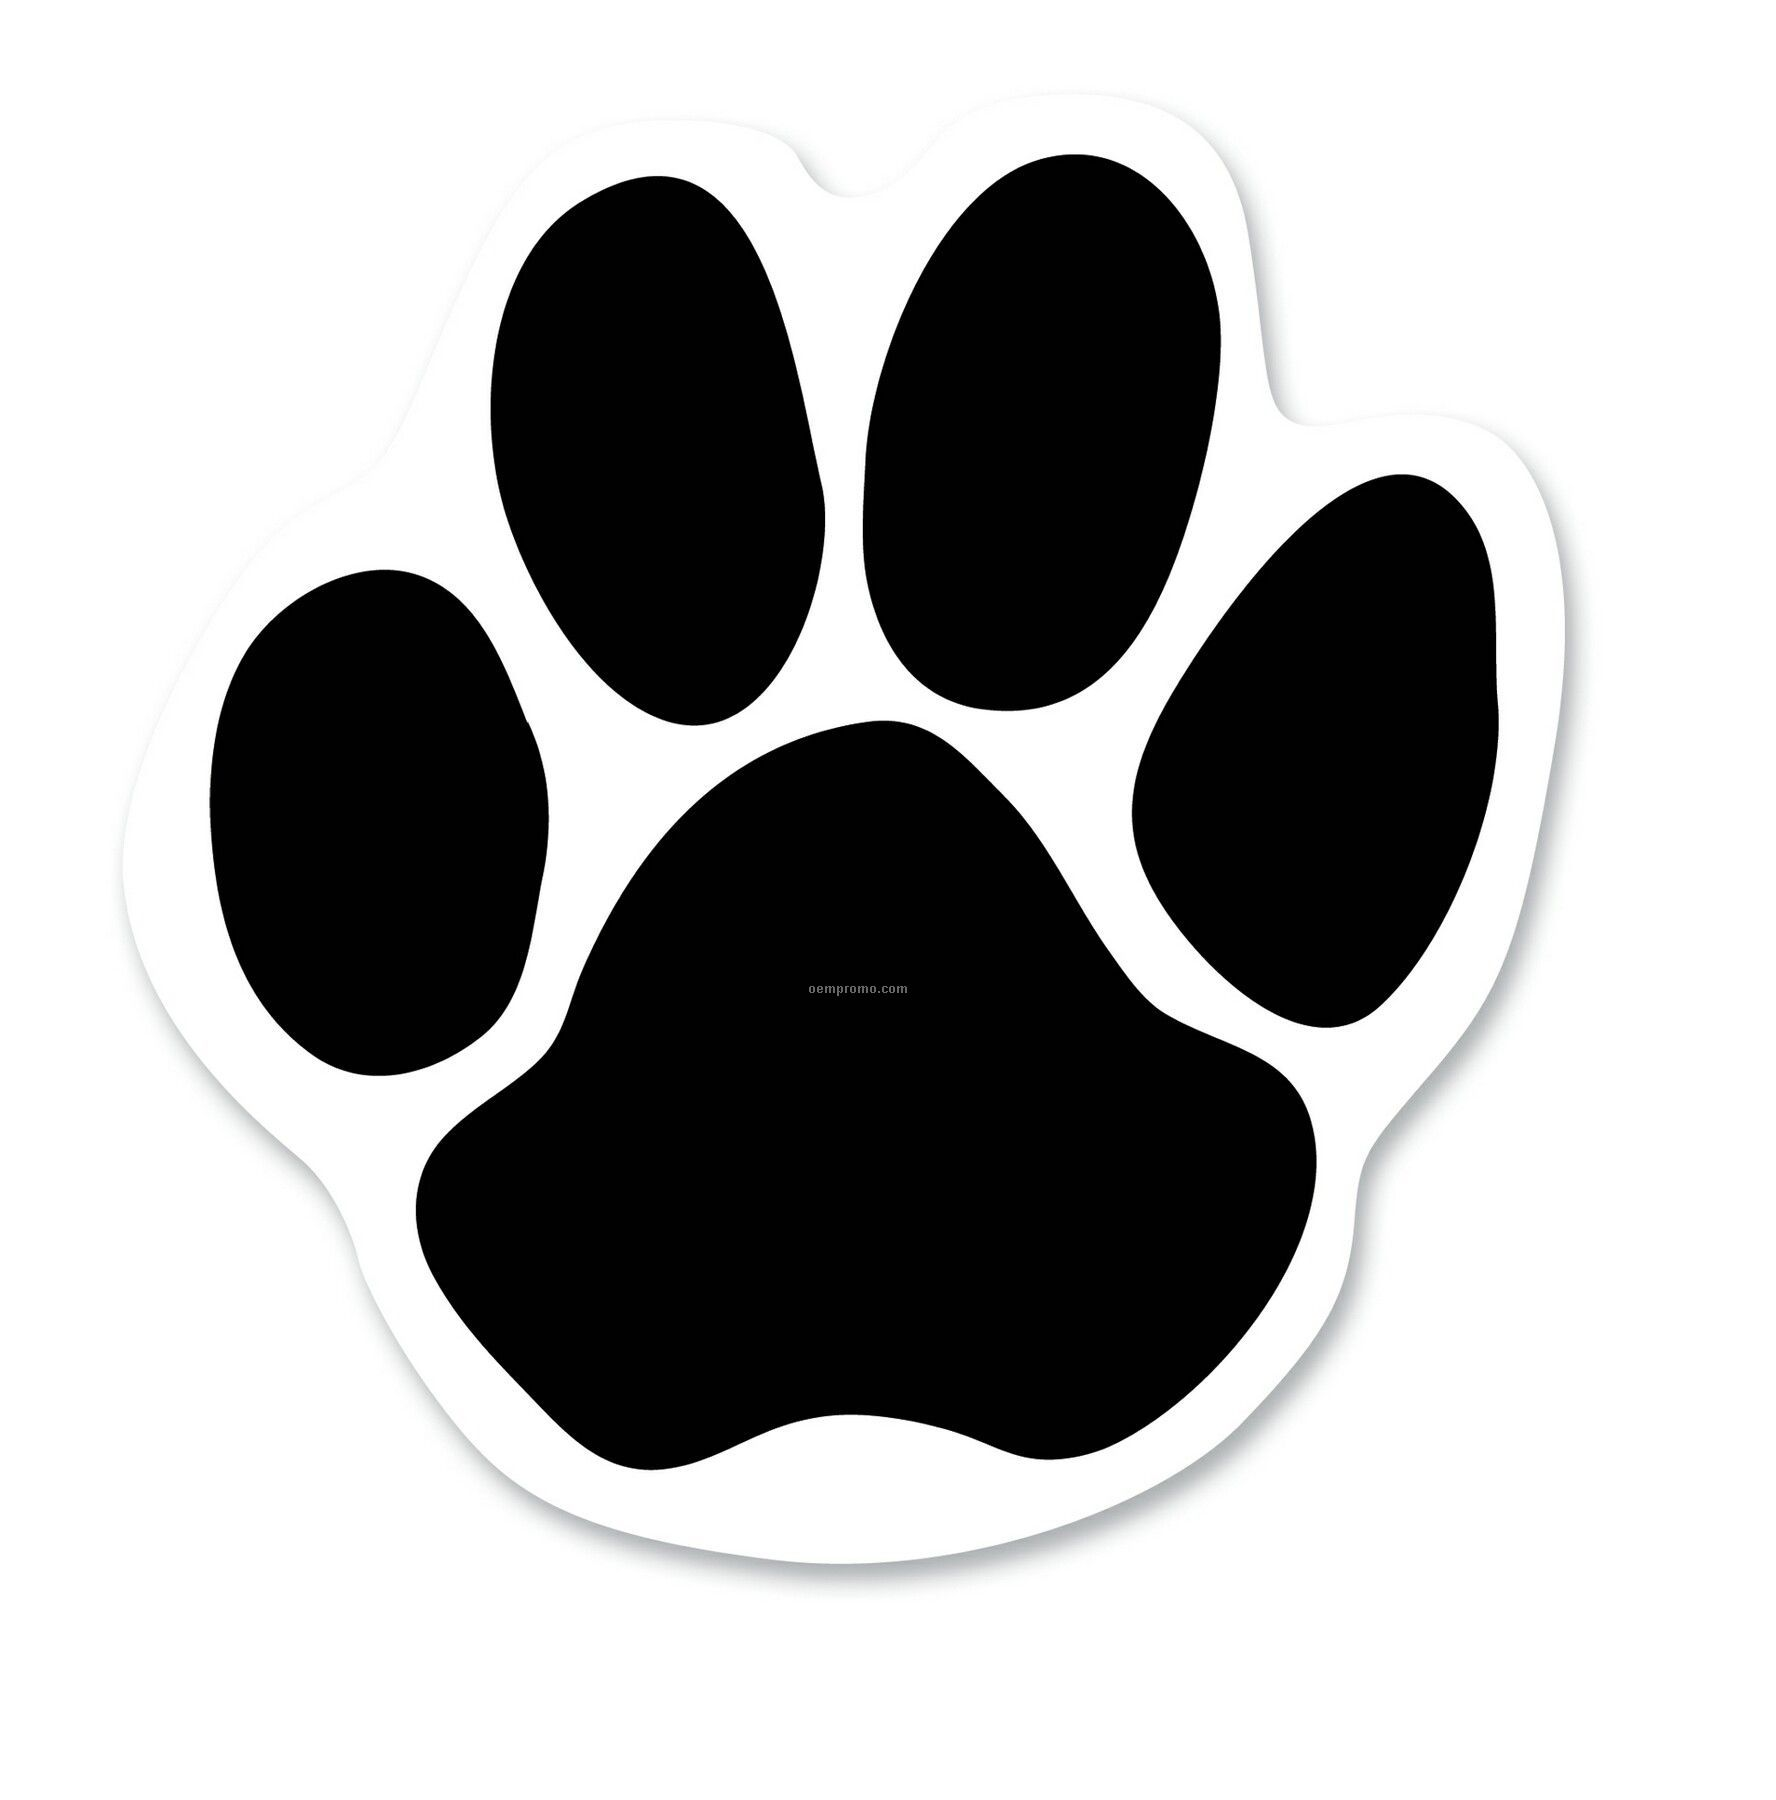 Bear paw print dog foot prints logo free download clip art on